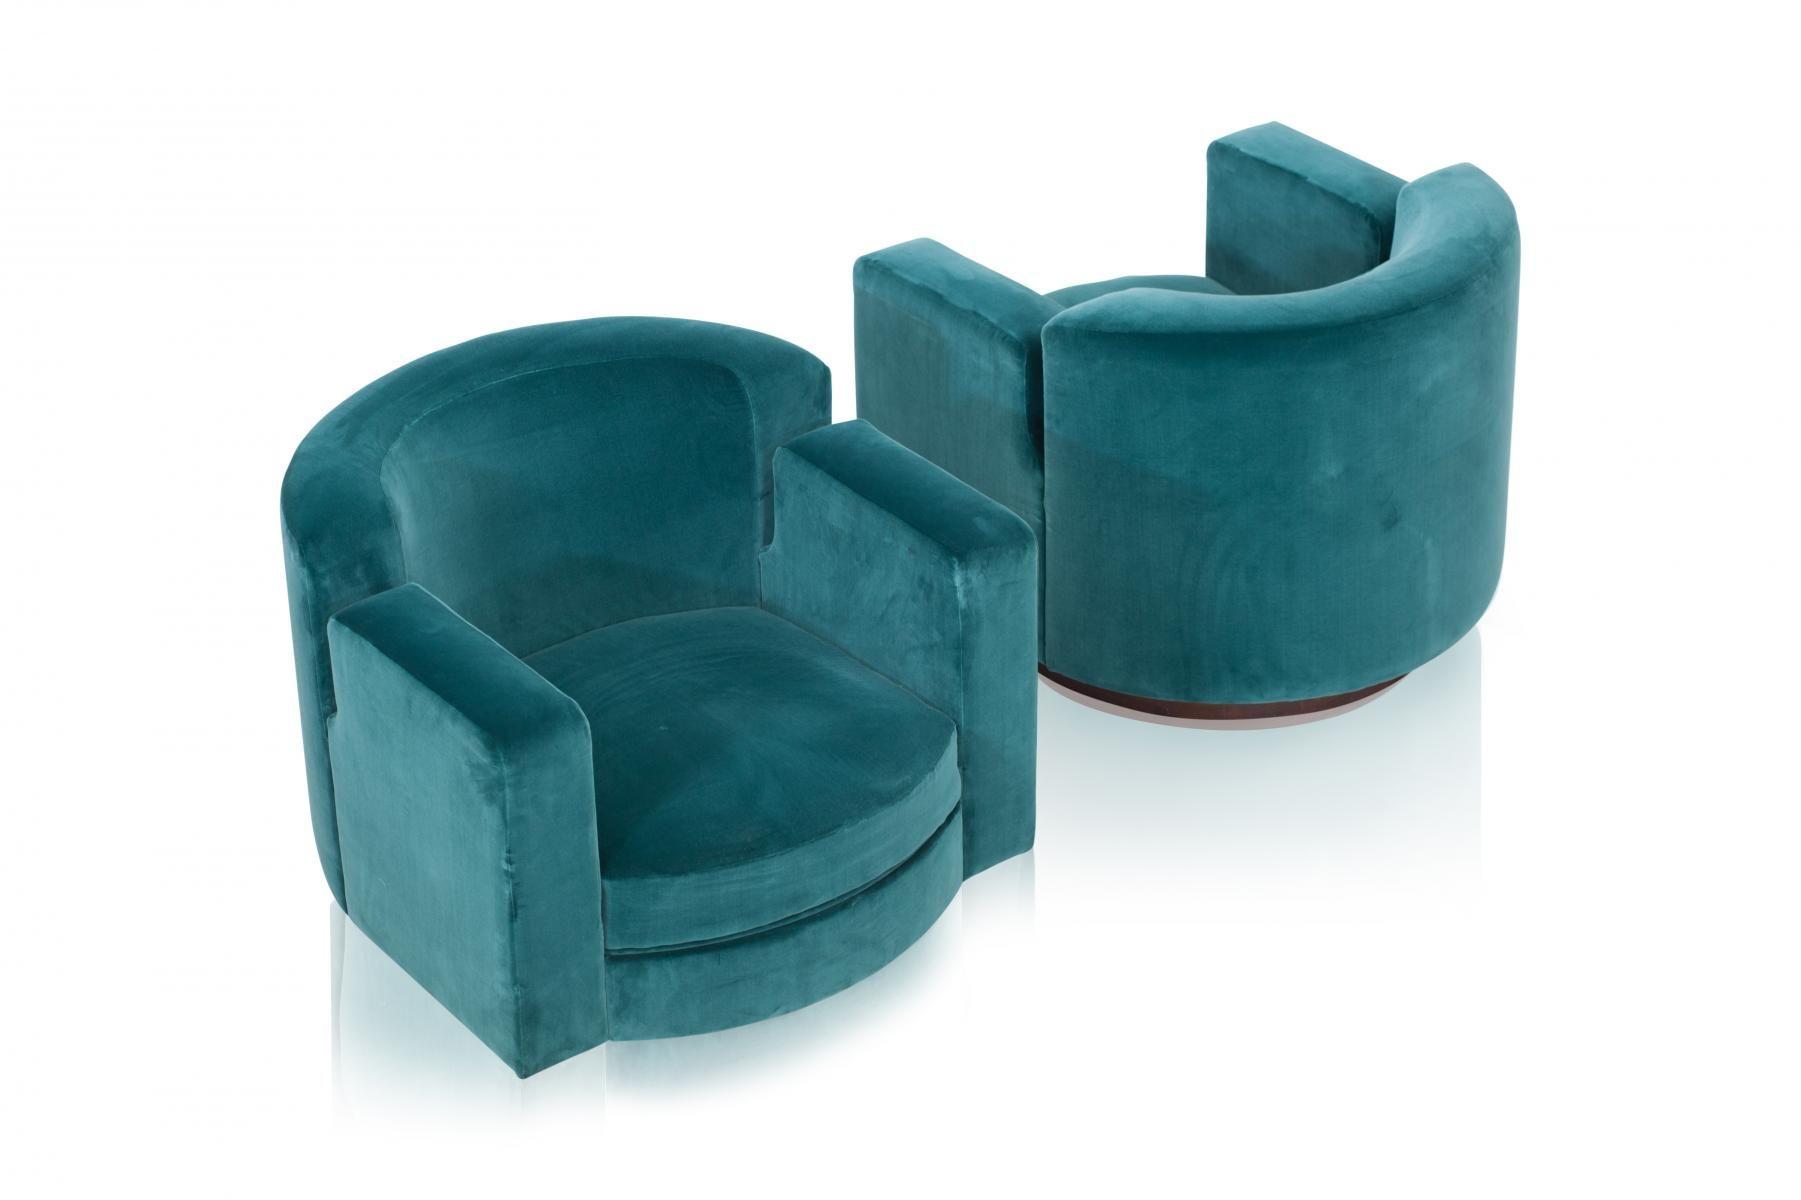 Blue velvet swivel lounge chairs by milo baughman 1960s